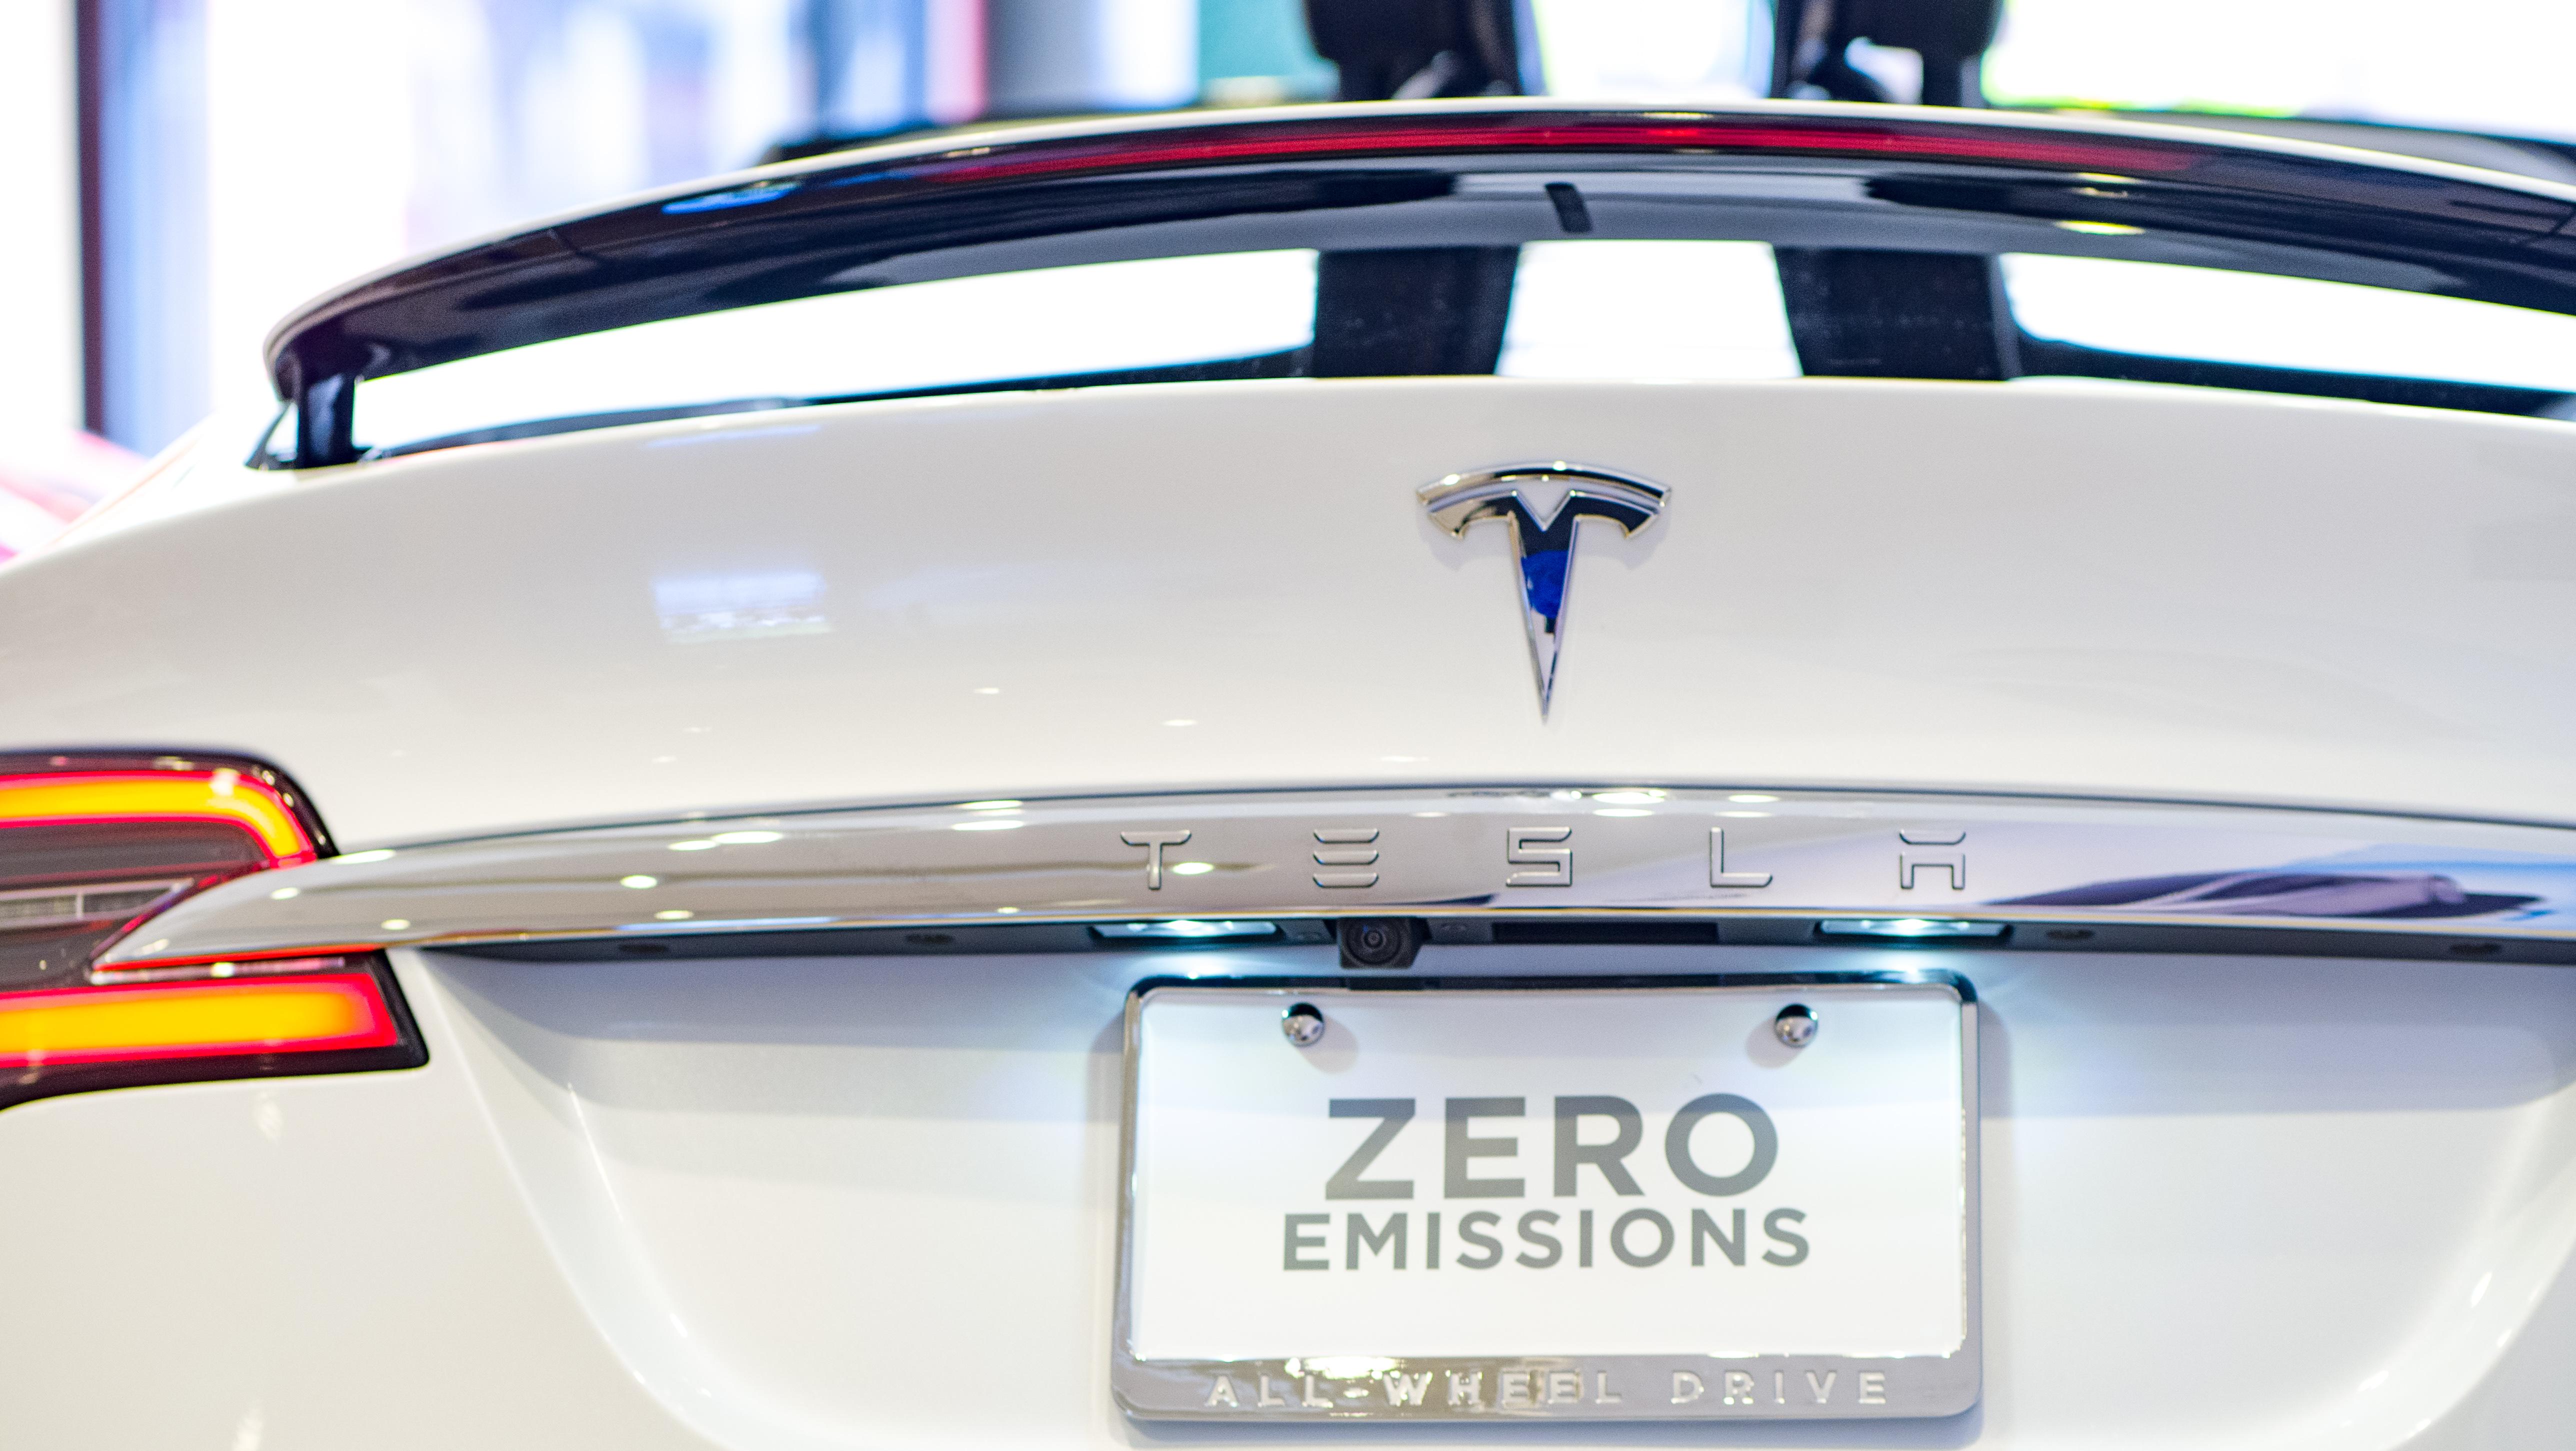 3 Charts Show Tesla Incs Huge Vehicle Sales Growth The Motley Fool Motor Design Diagram Pics